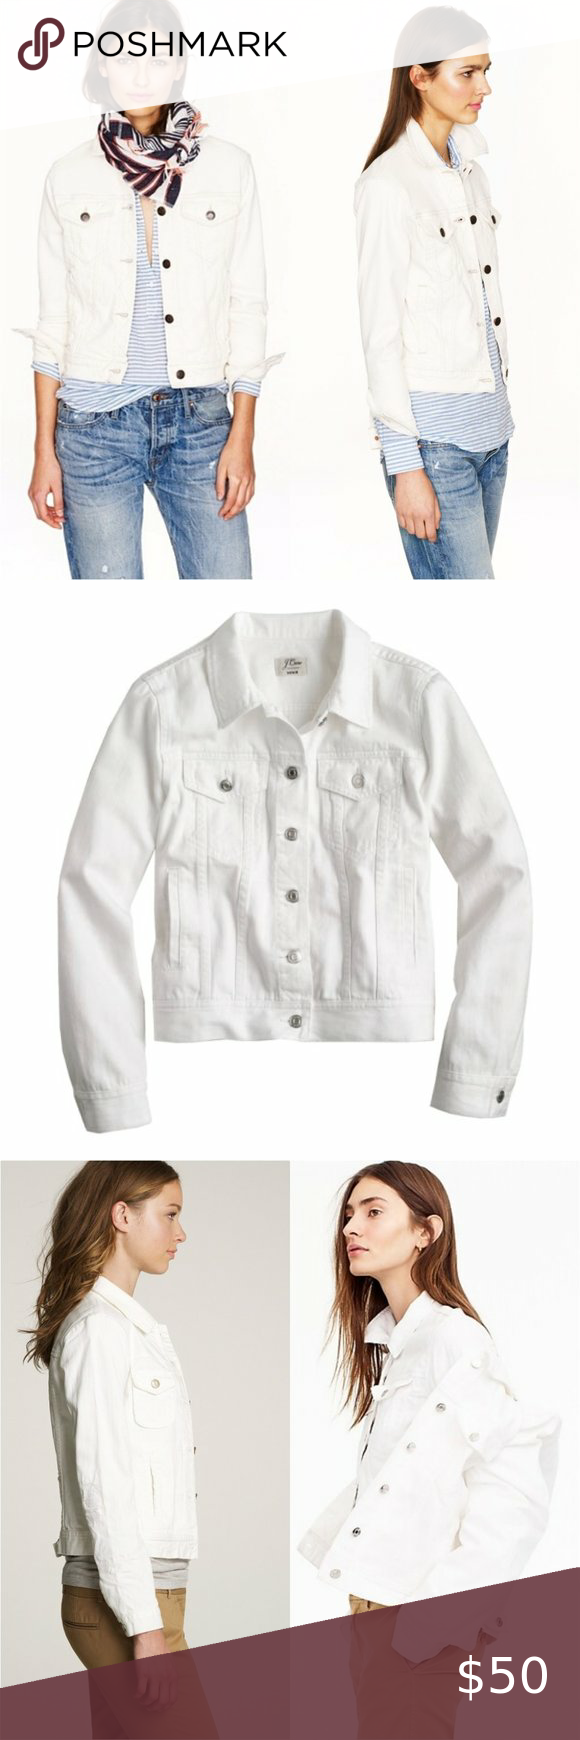 J Crew Faded White Denim Button Jean Jacket Chic Clothing Style Vintage Denim Jacket Light Wash Denim Jacket [ 1740 x 580 Pixel ]